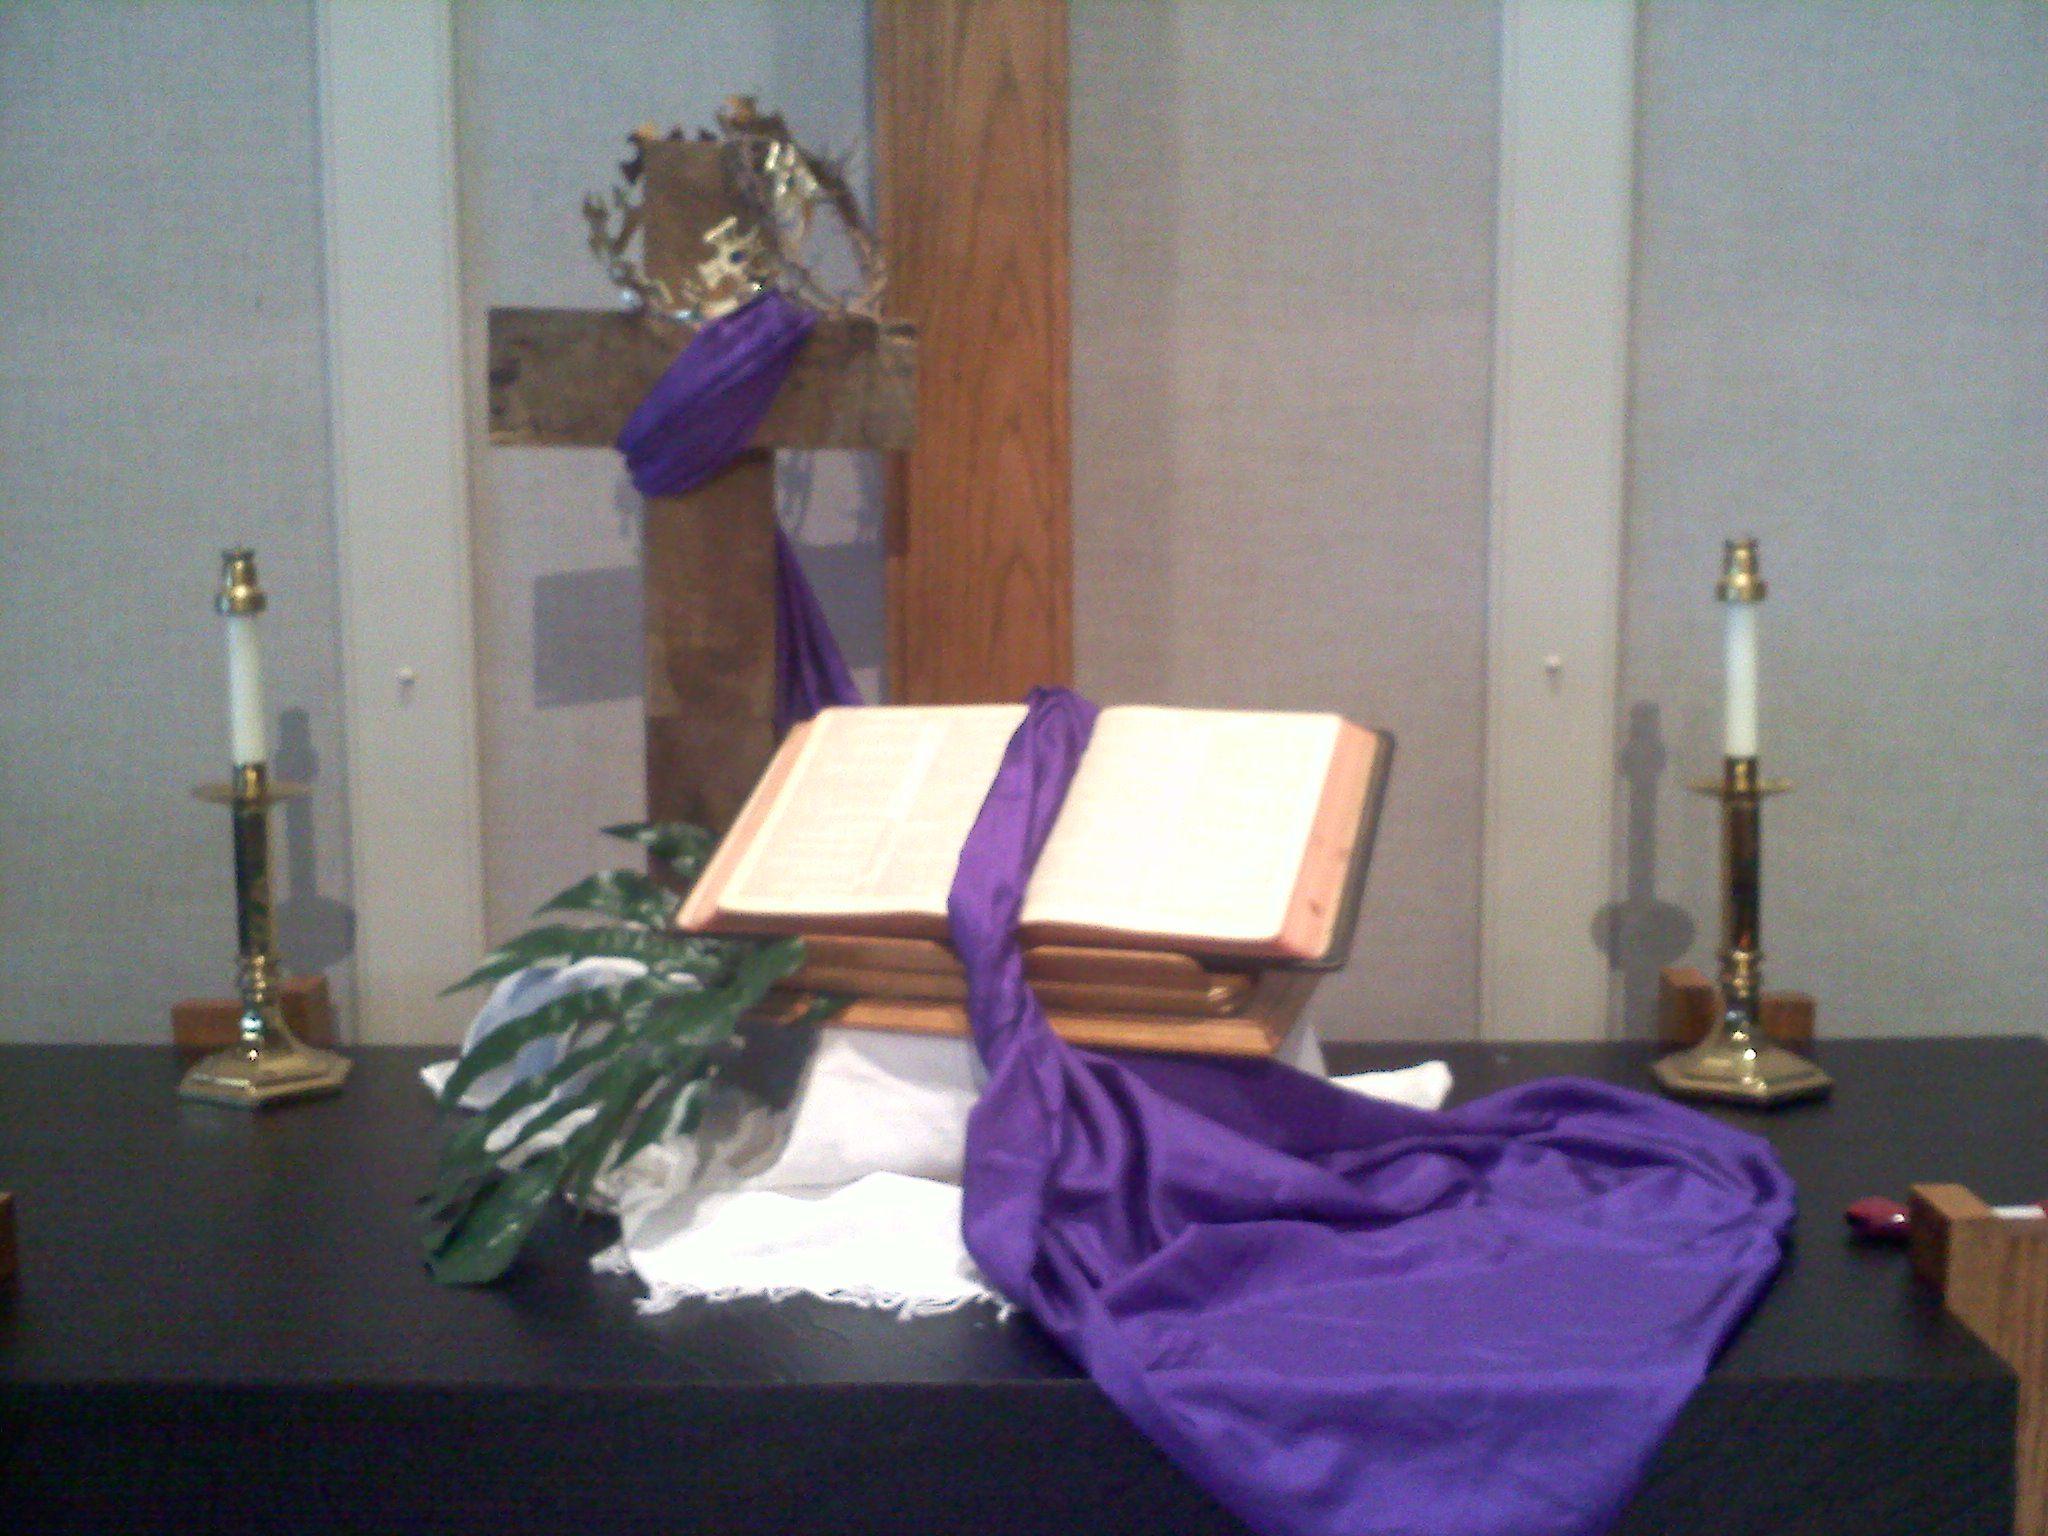 Methodist church altar decorations google search for Altar decoration ideas